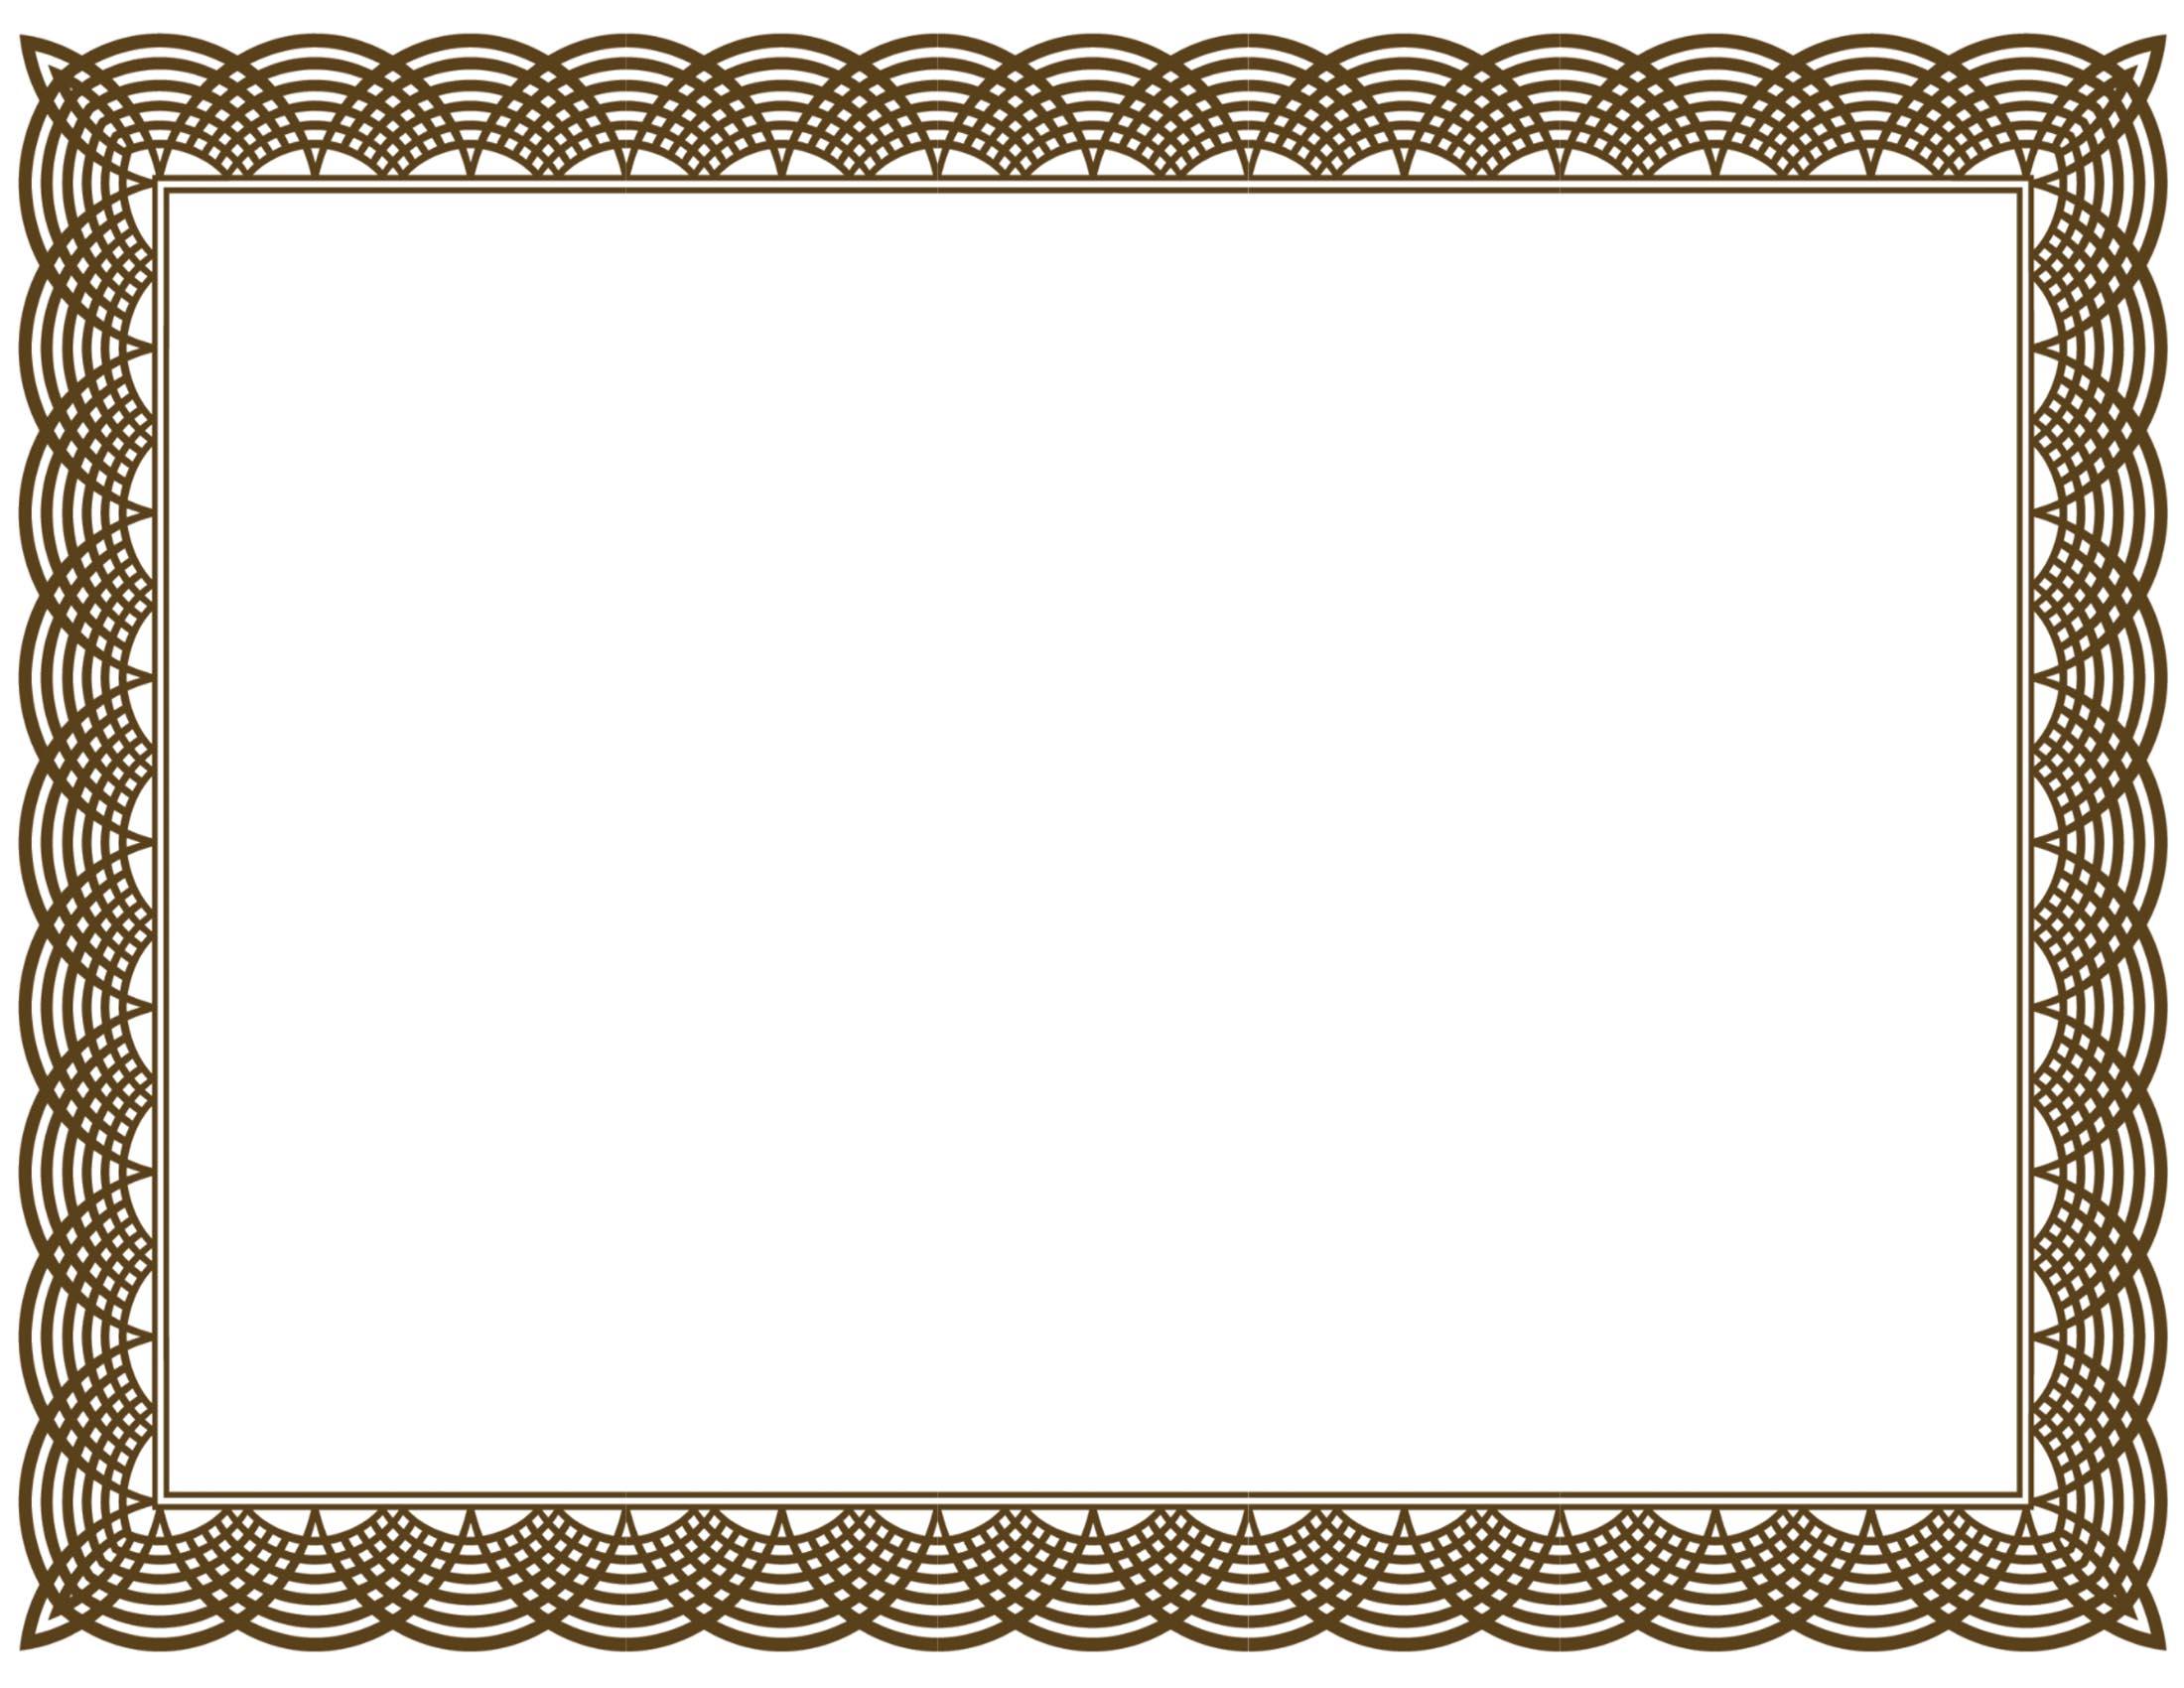 certificate template border sample medical research grant proposal certificate template border